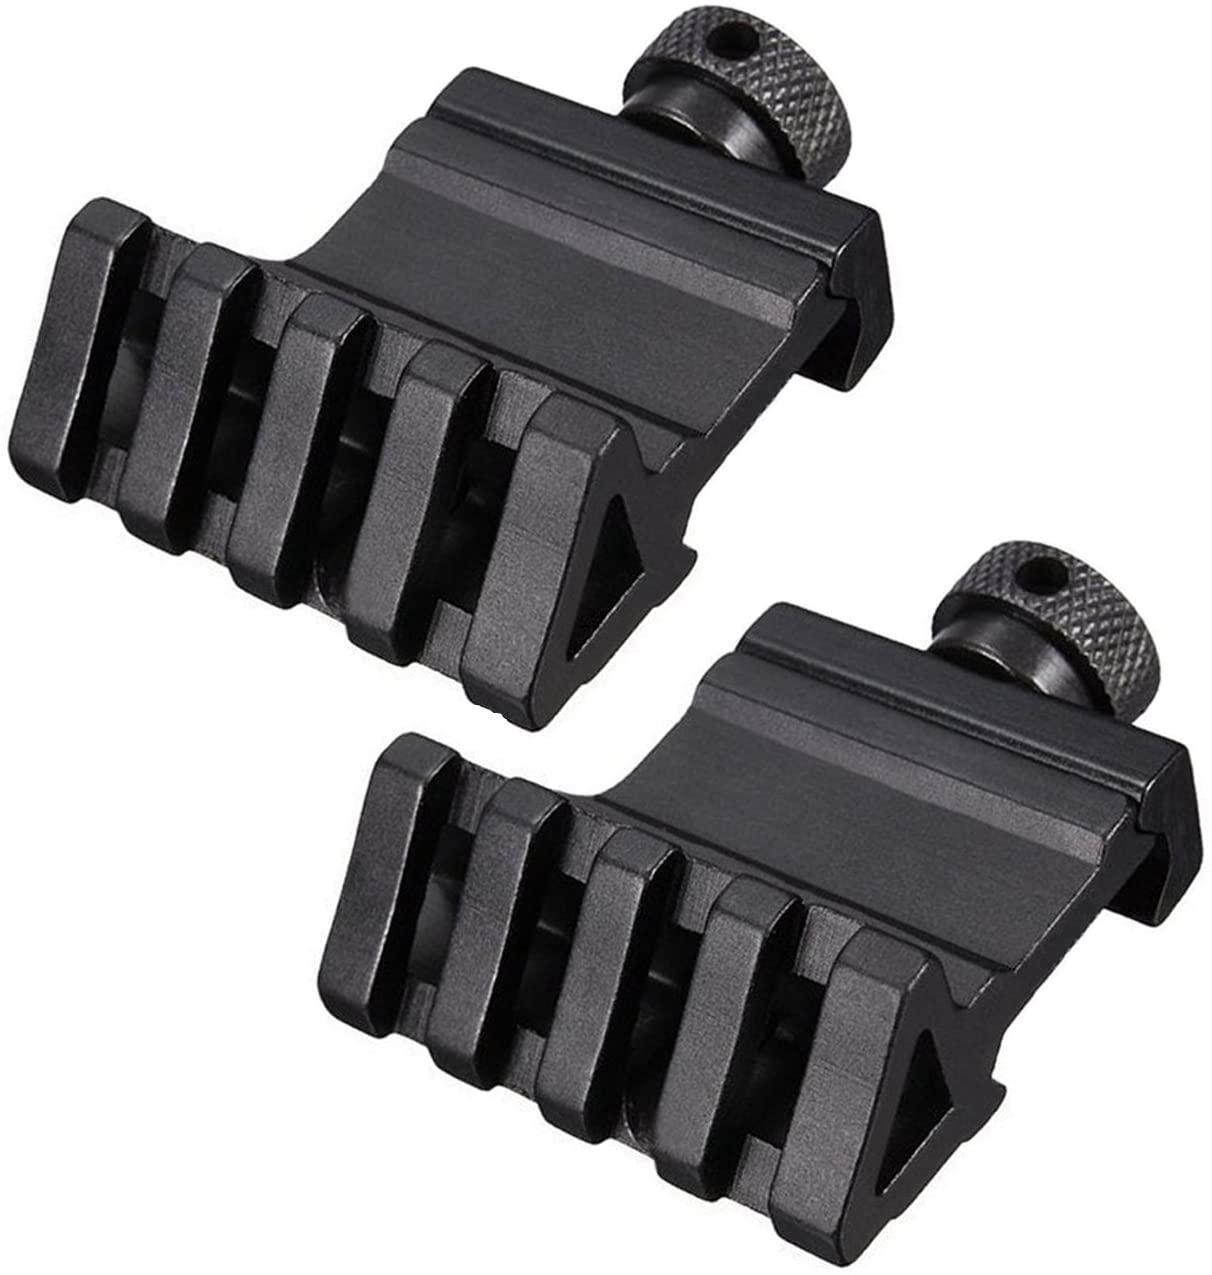 HooGou 2 Pcs 45 Degree 20mm 4 Slots Offset Angle Rail Mount Picatinny Weaver Style for Mounting Flashlight Sight Black 2 Pack